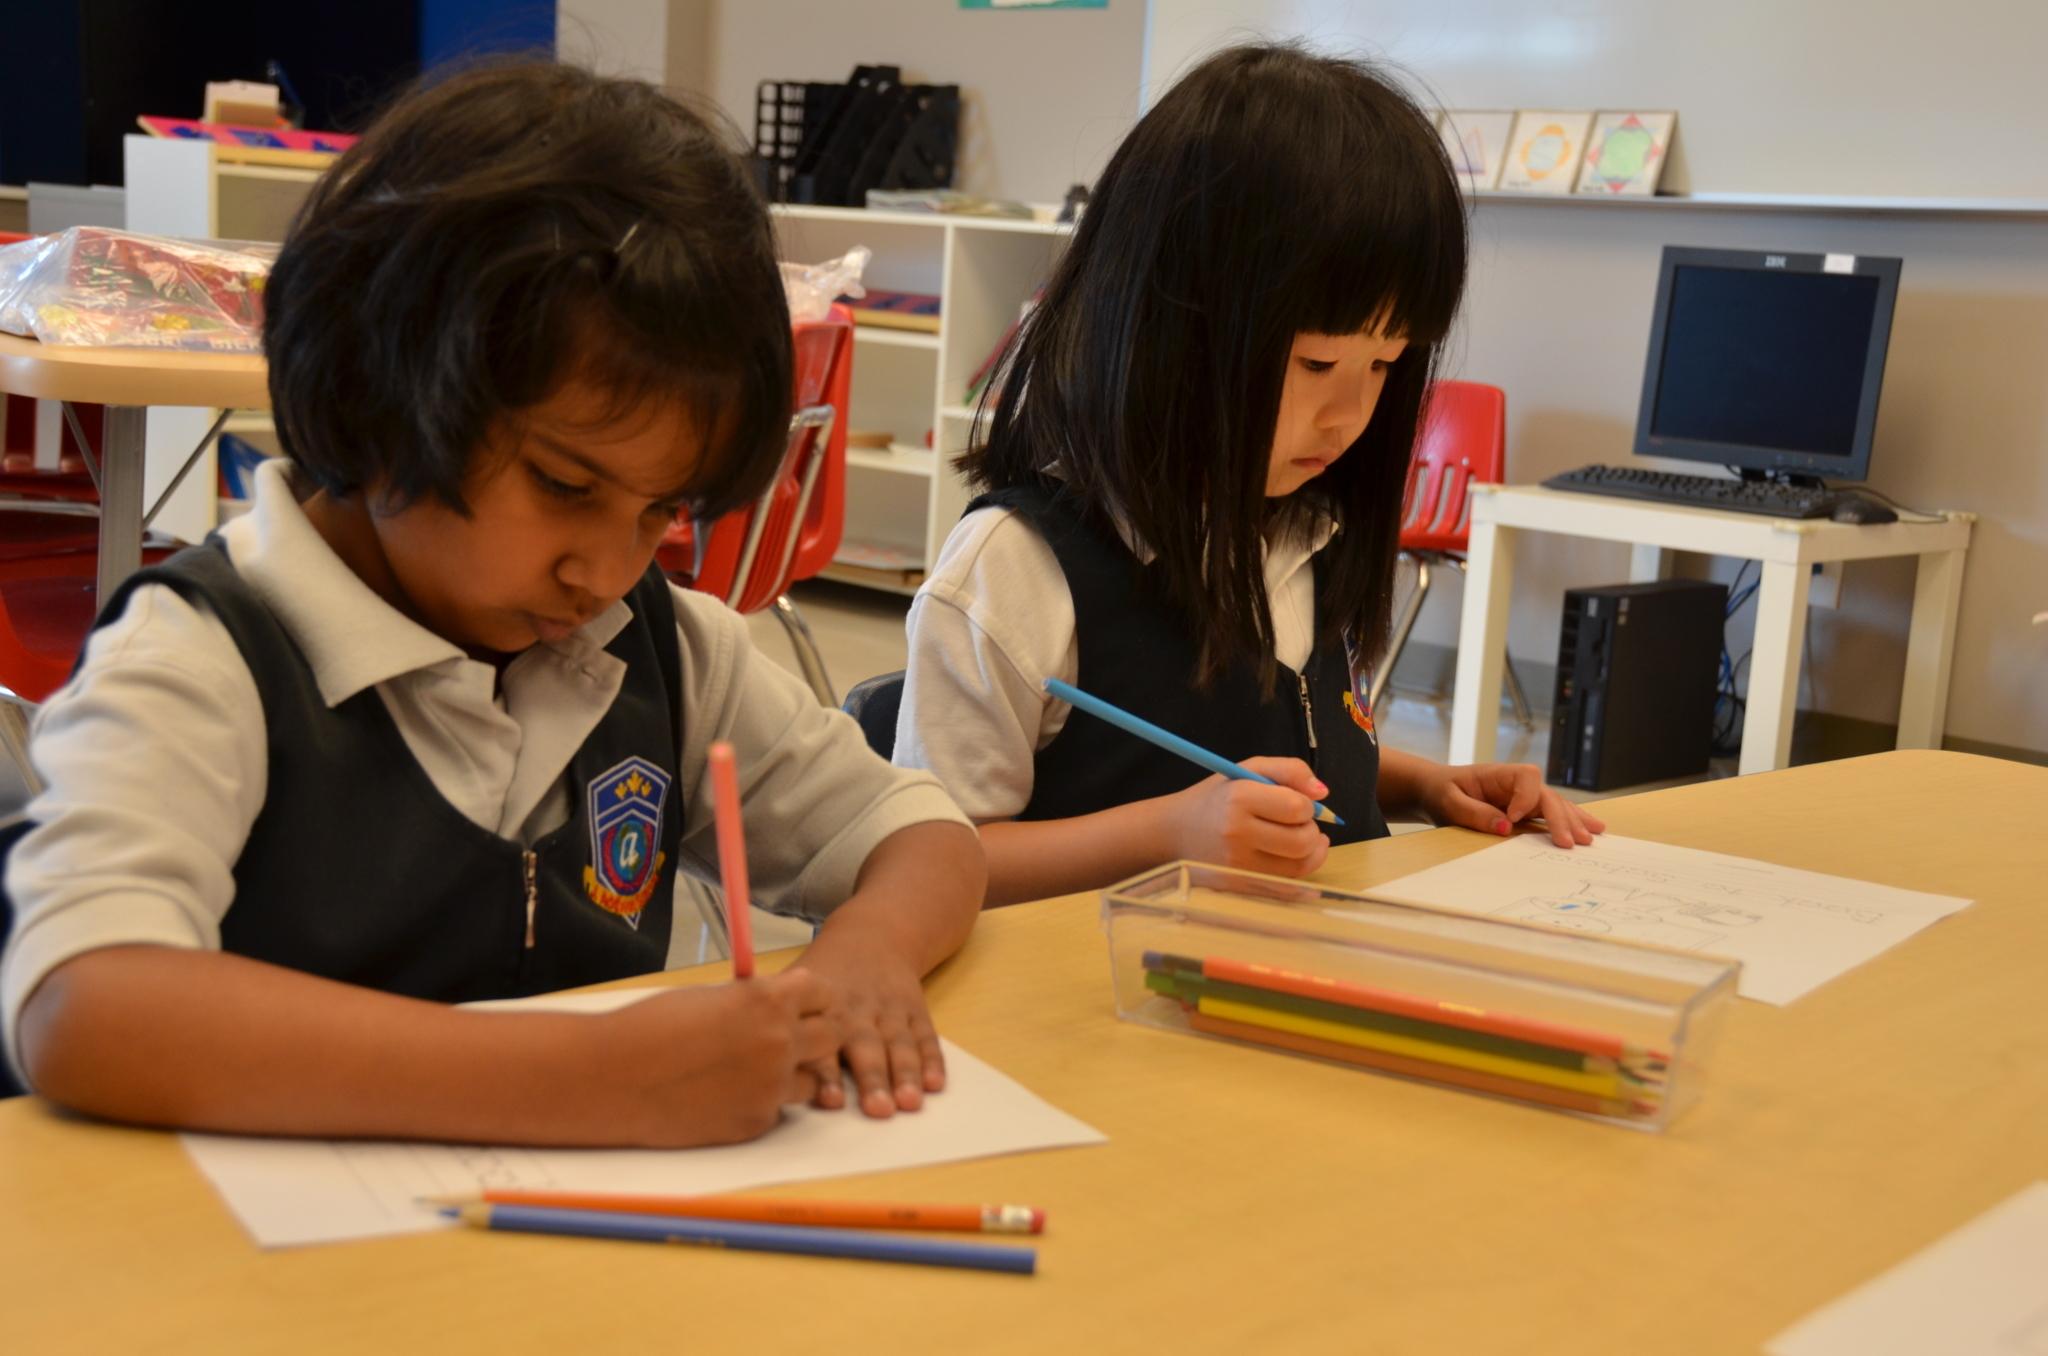 J Addison School in Markham: Montessori programs at J. Addison School